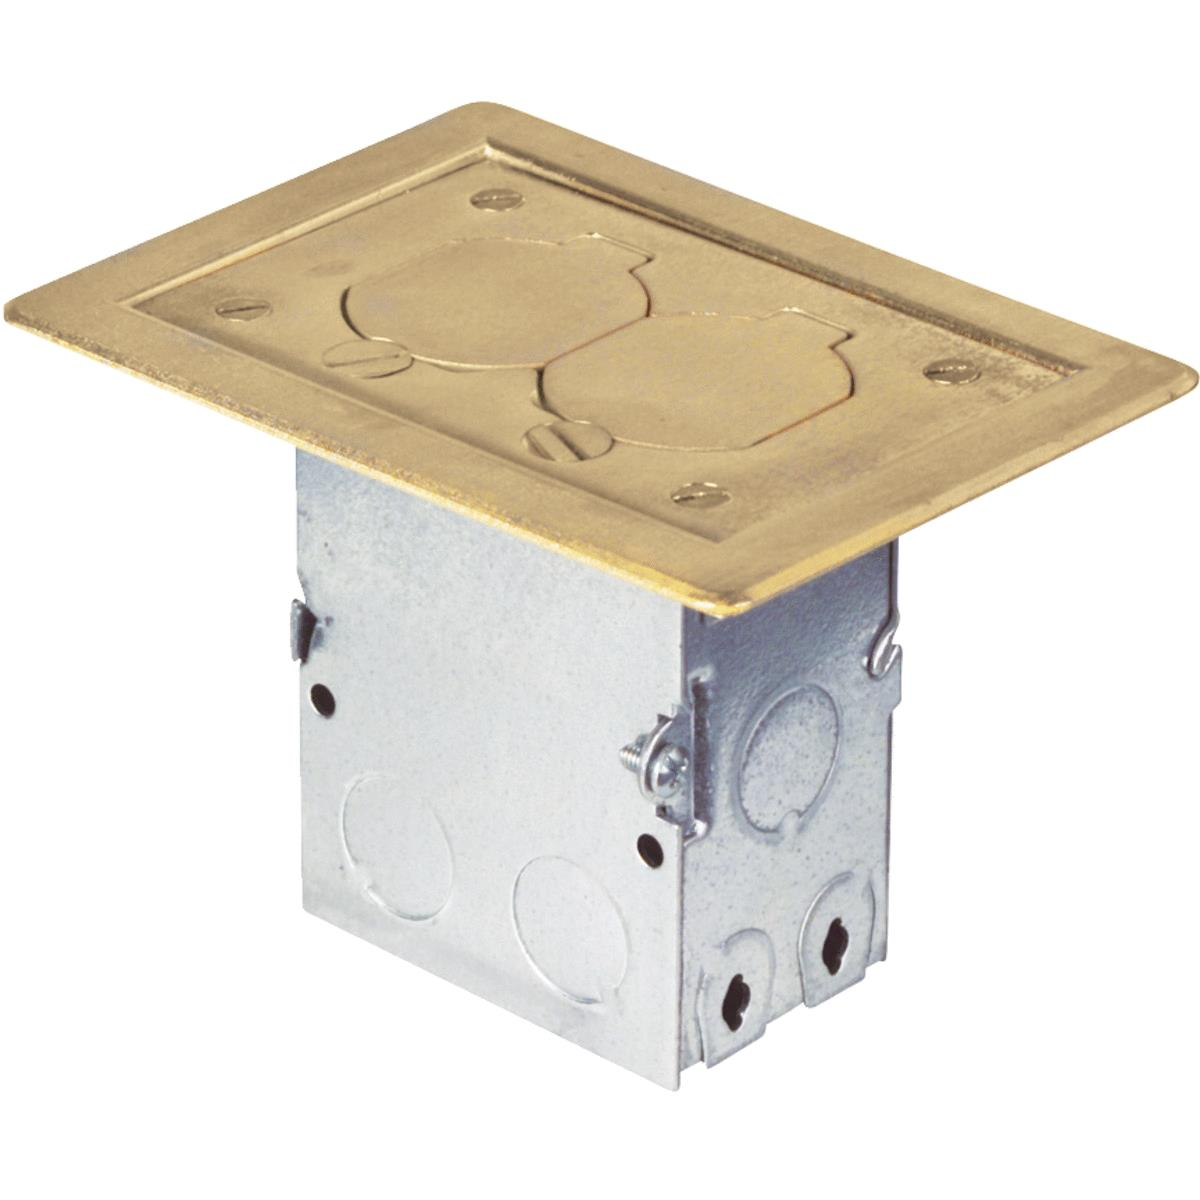 Buy Raco Floor Box Outlet Kit